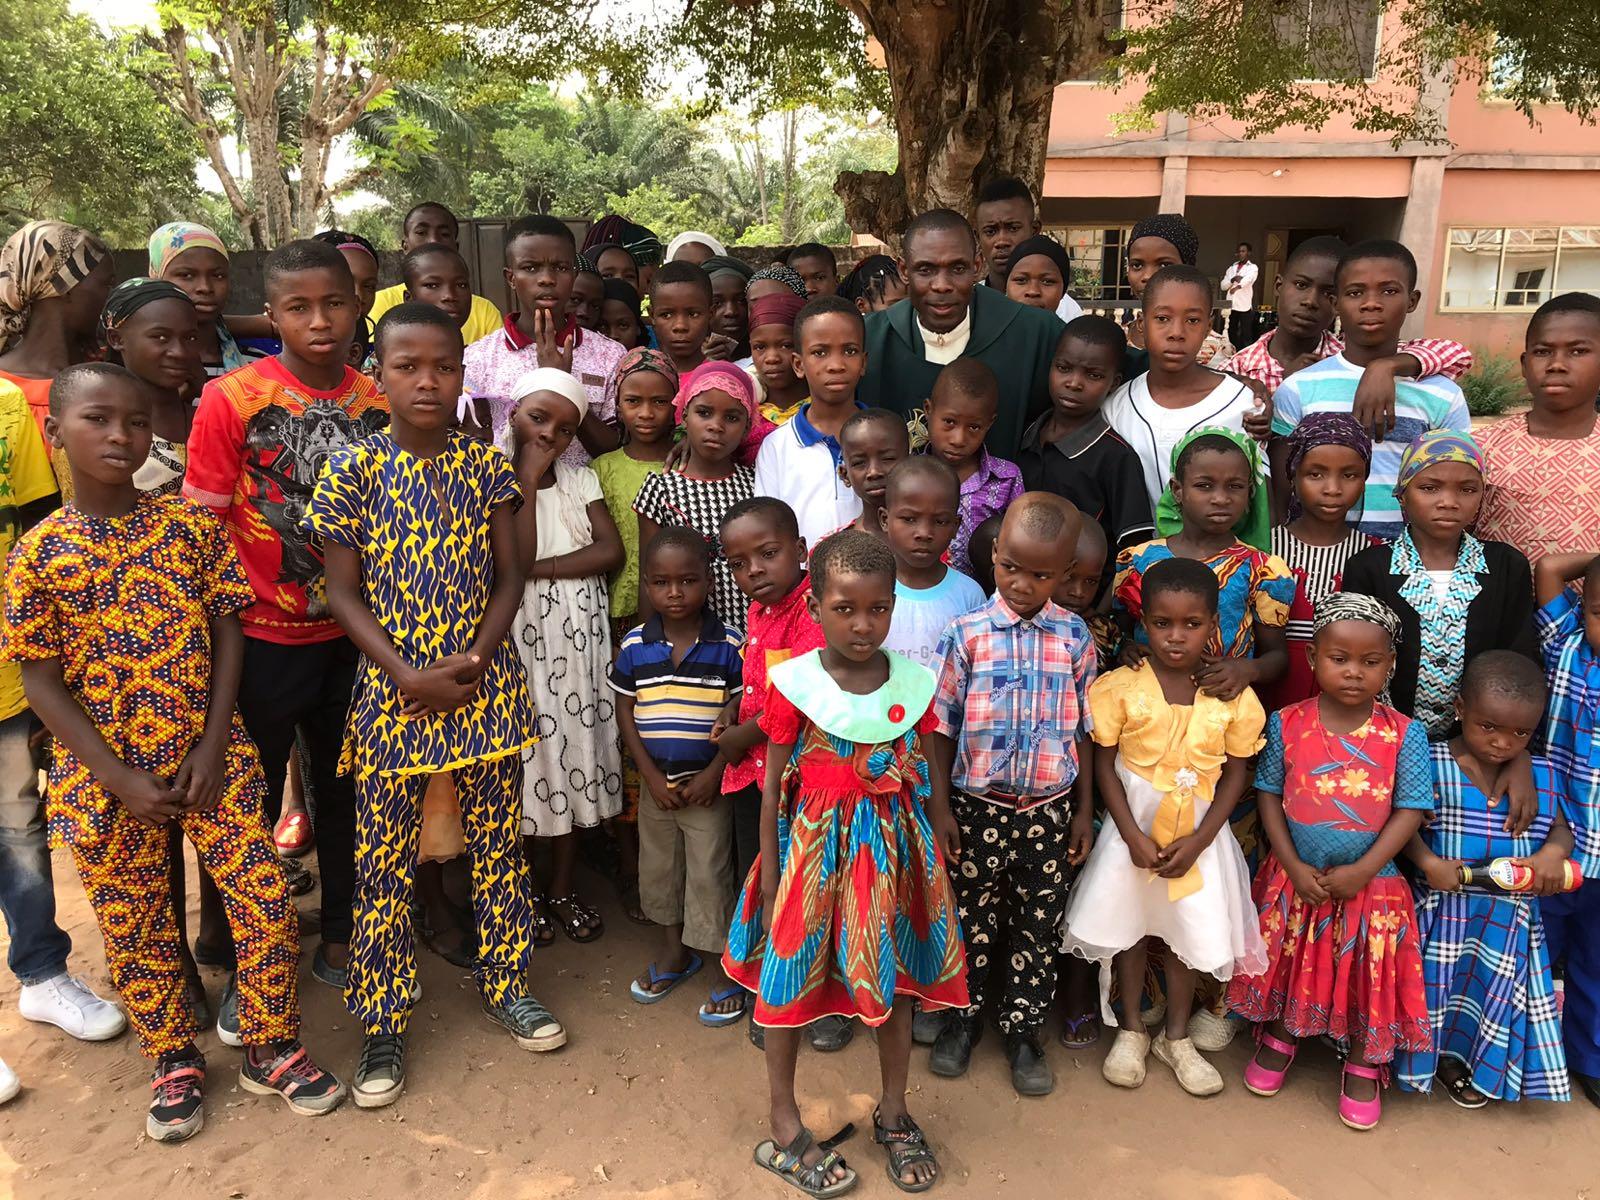 Father Kingsley Ihejirika with DMIWOO orphans